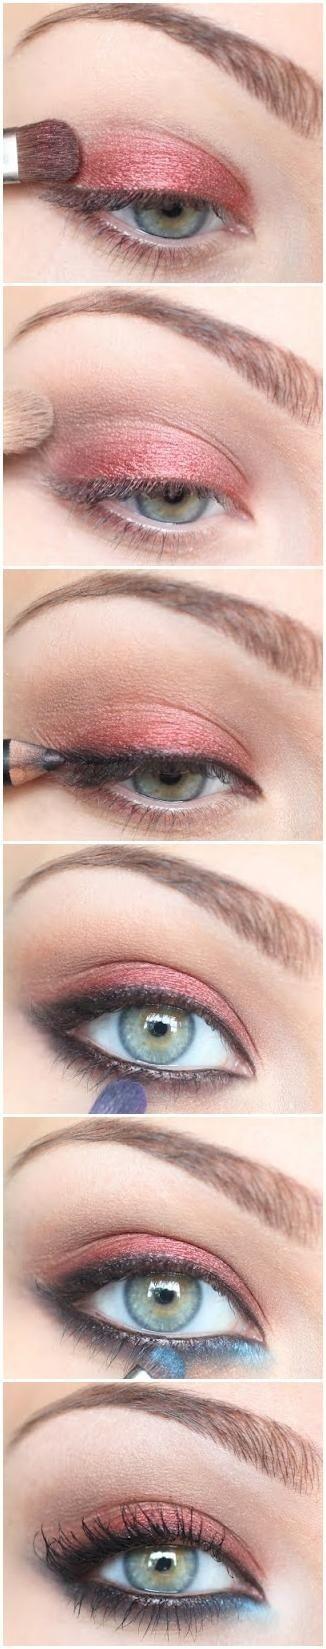 eyeshadow saumon, marron et noir! :p